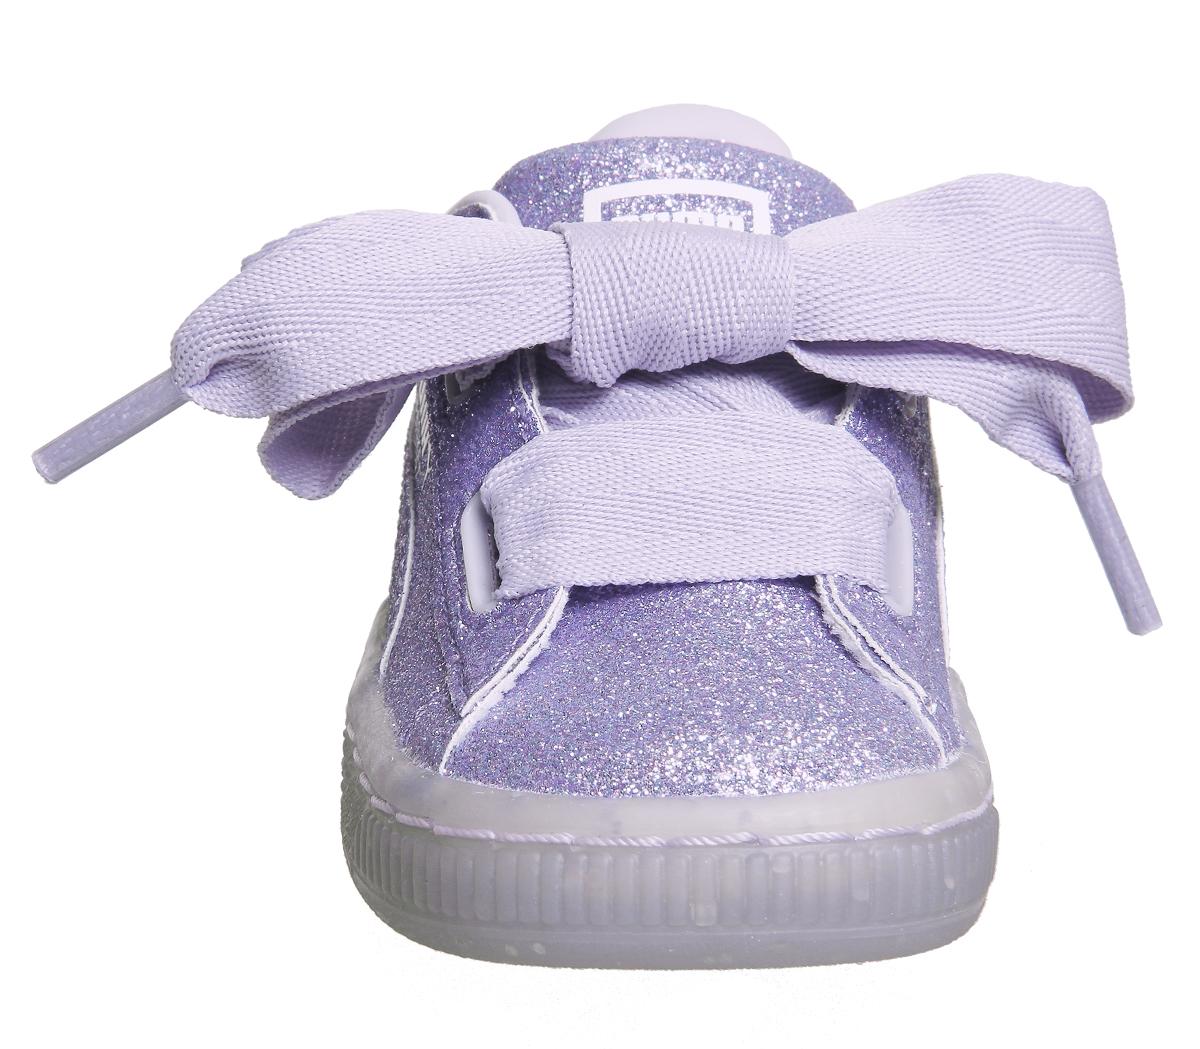 4b5399031e0b Sentinel Kids Puma Basket Heart Inf Thistle Glitter Exclusive Kids